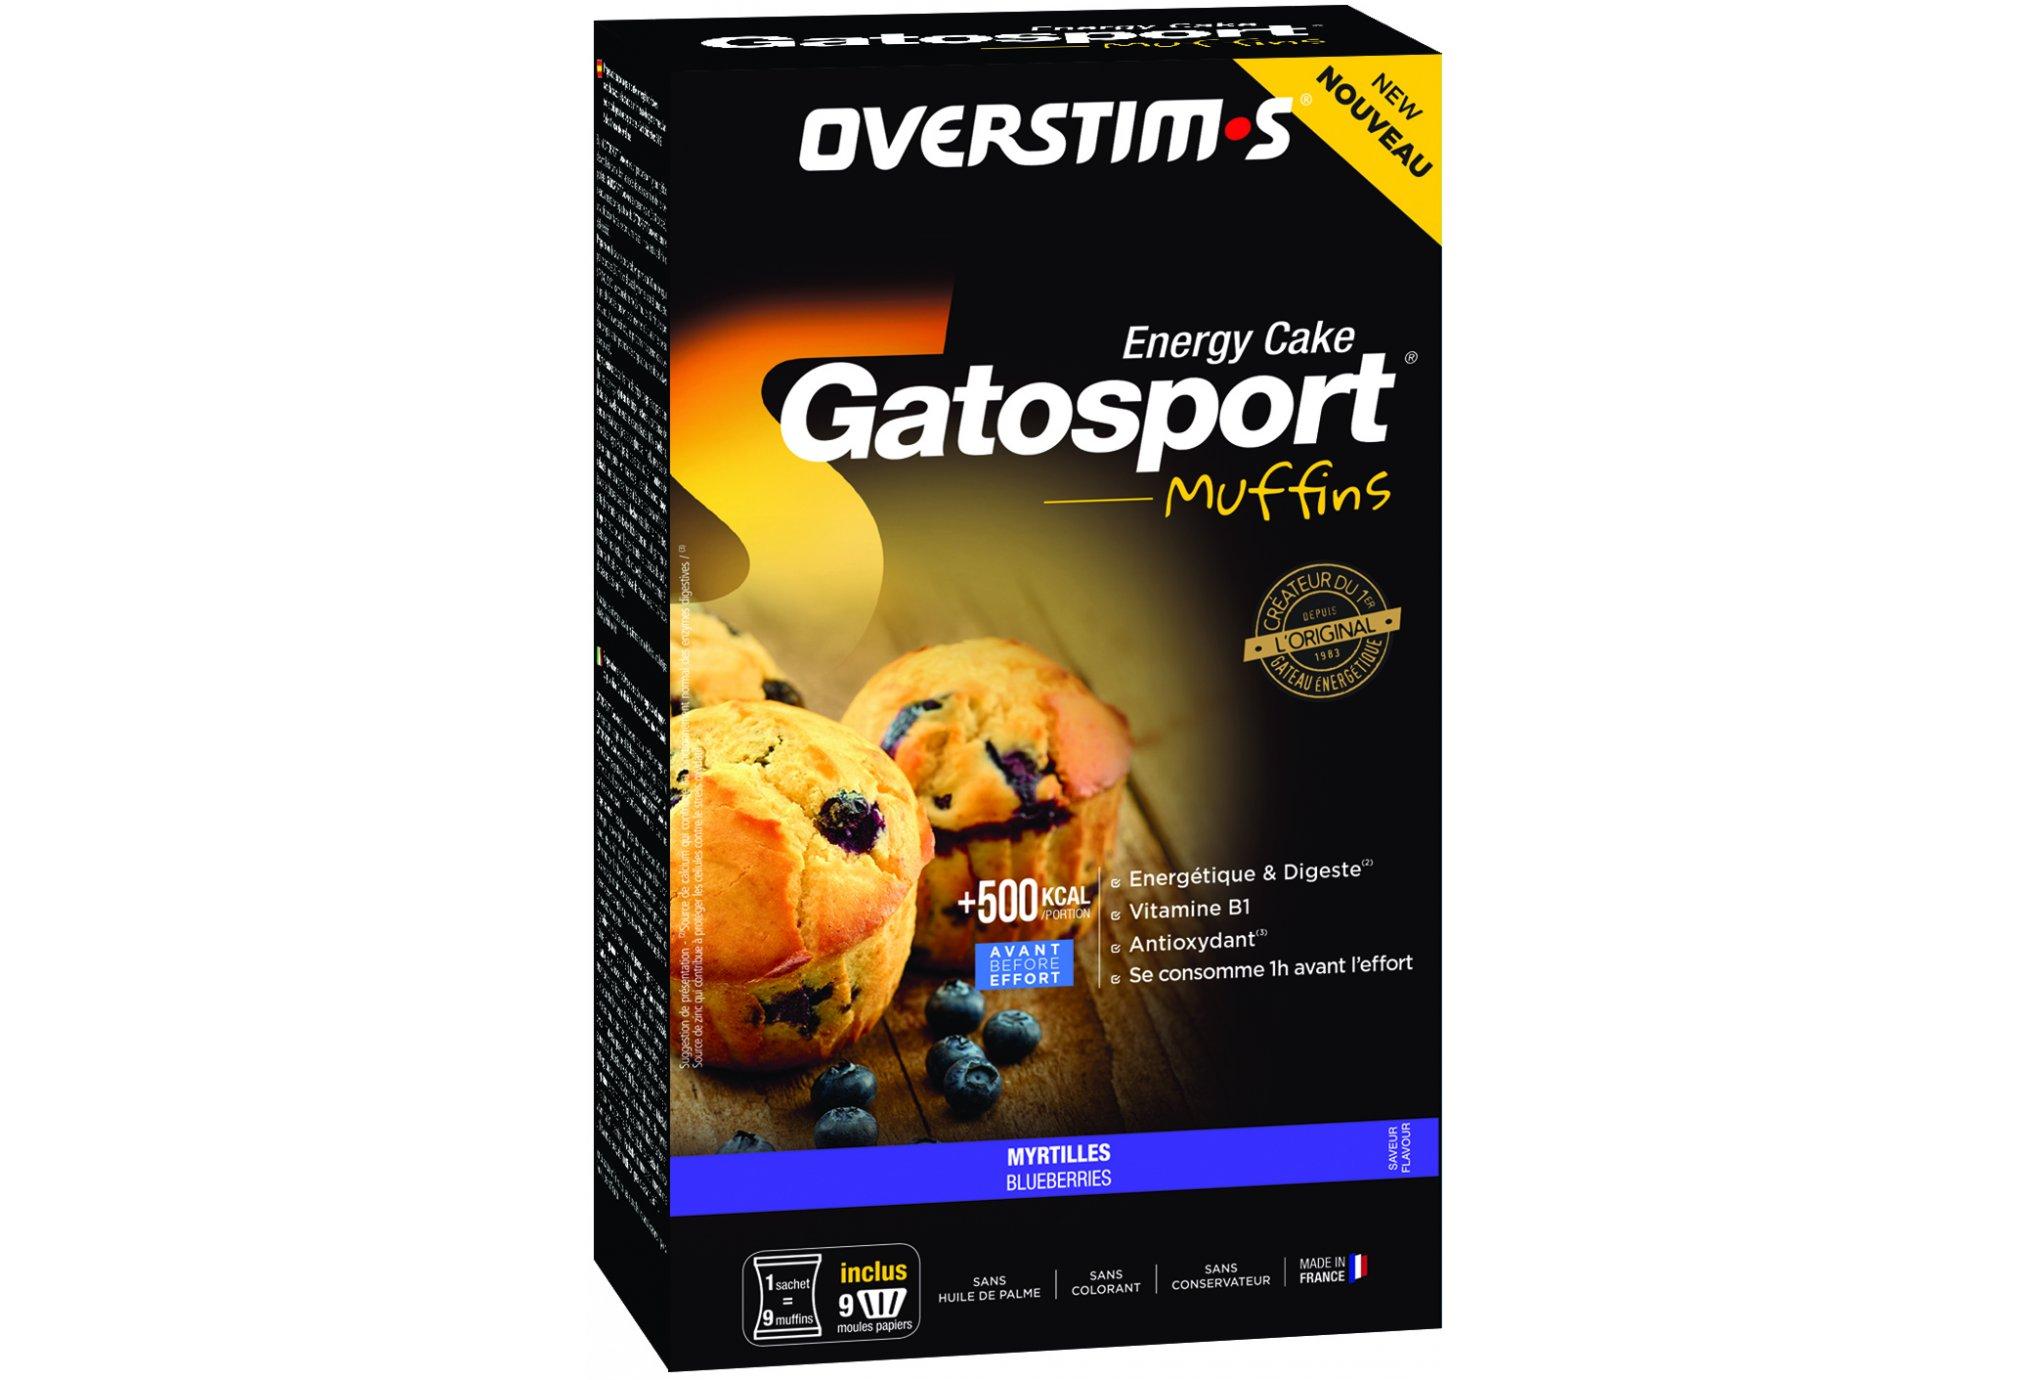 OVERSTIMS Gatosport Muffins - Myrtille Diététique Préparation